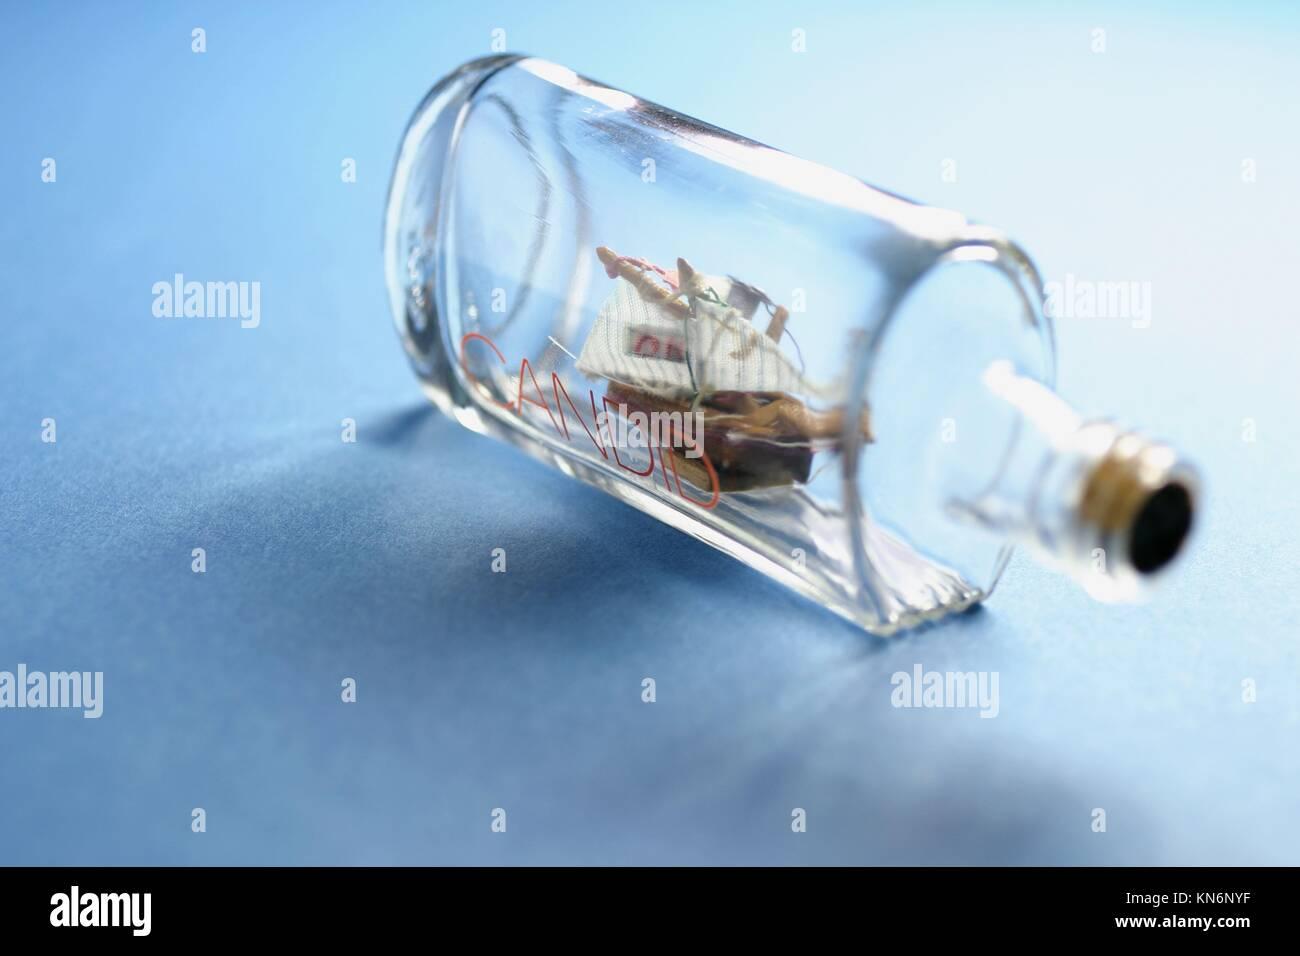 Ship model in bottle. - Stock Image